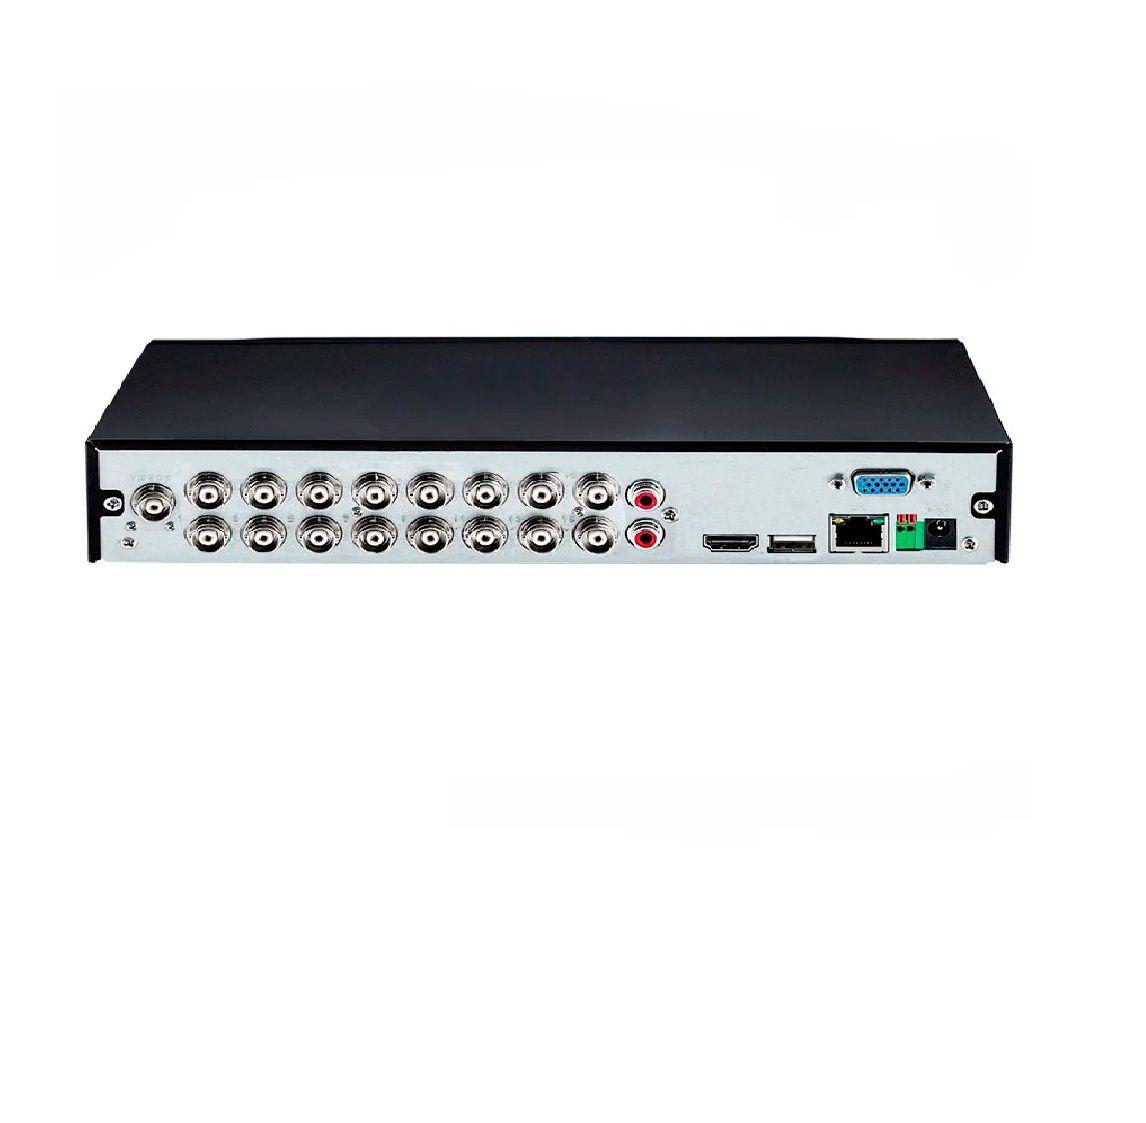 DVR Intelbras MHDX 1116 Multi HD - 16 Canais 1080p Lite + 2 Canais 6Mp IP